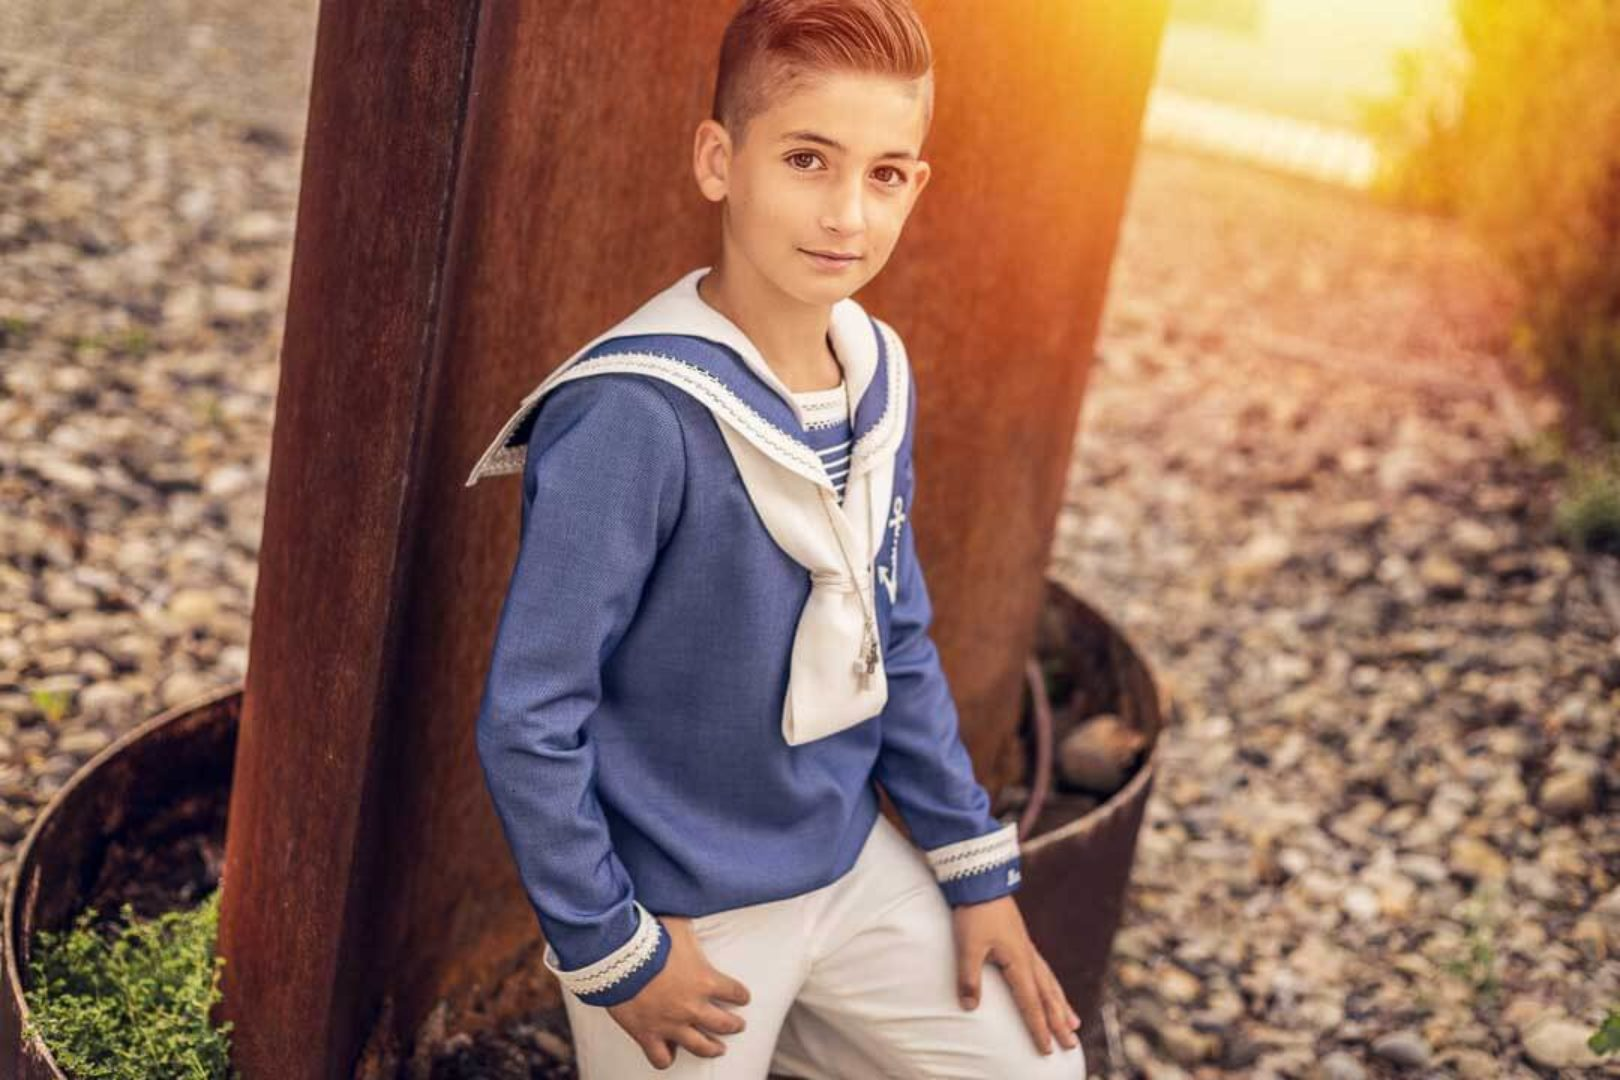 alejandra-lacosta-fotografa-infantil-zaragoza-reportaje-comunion-niño-exterior-retrato